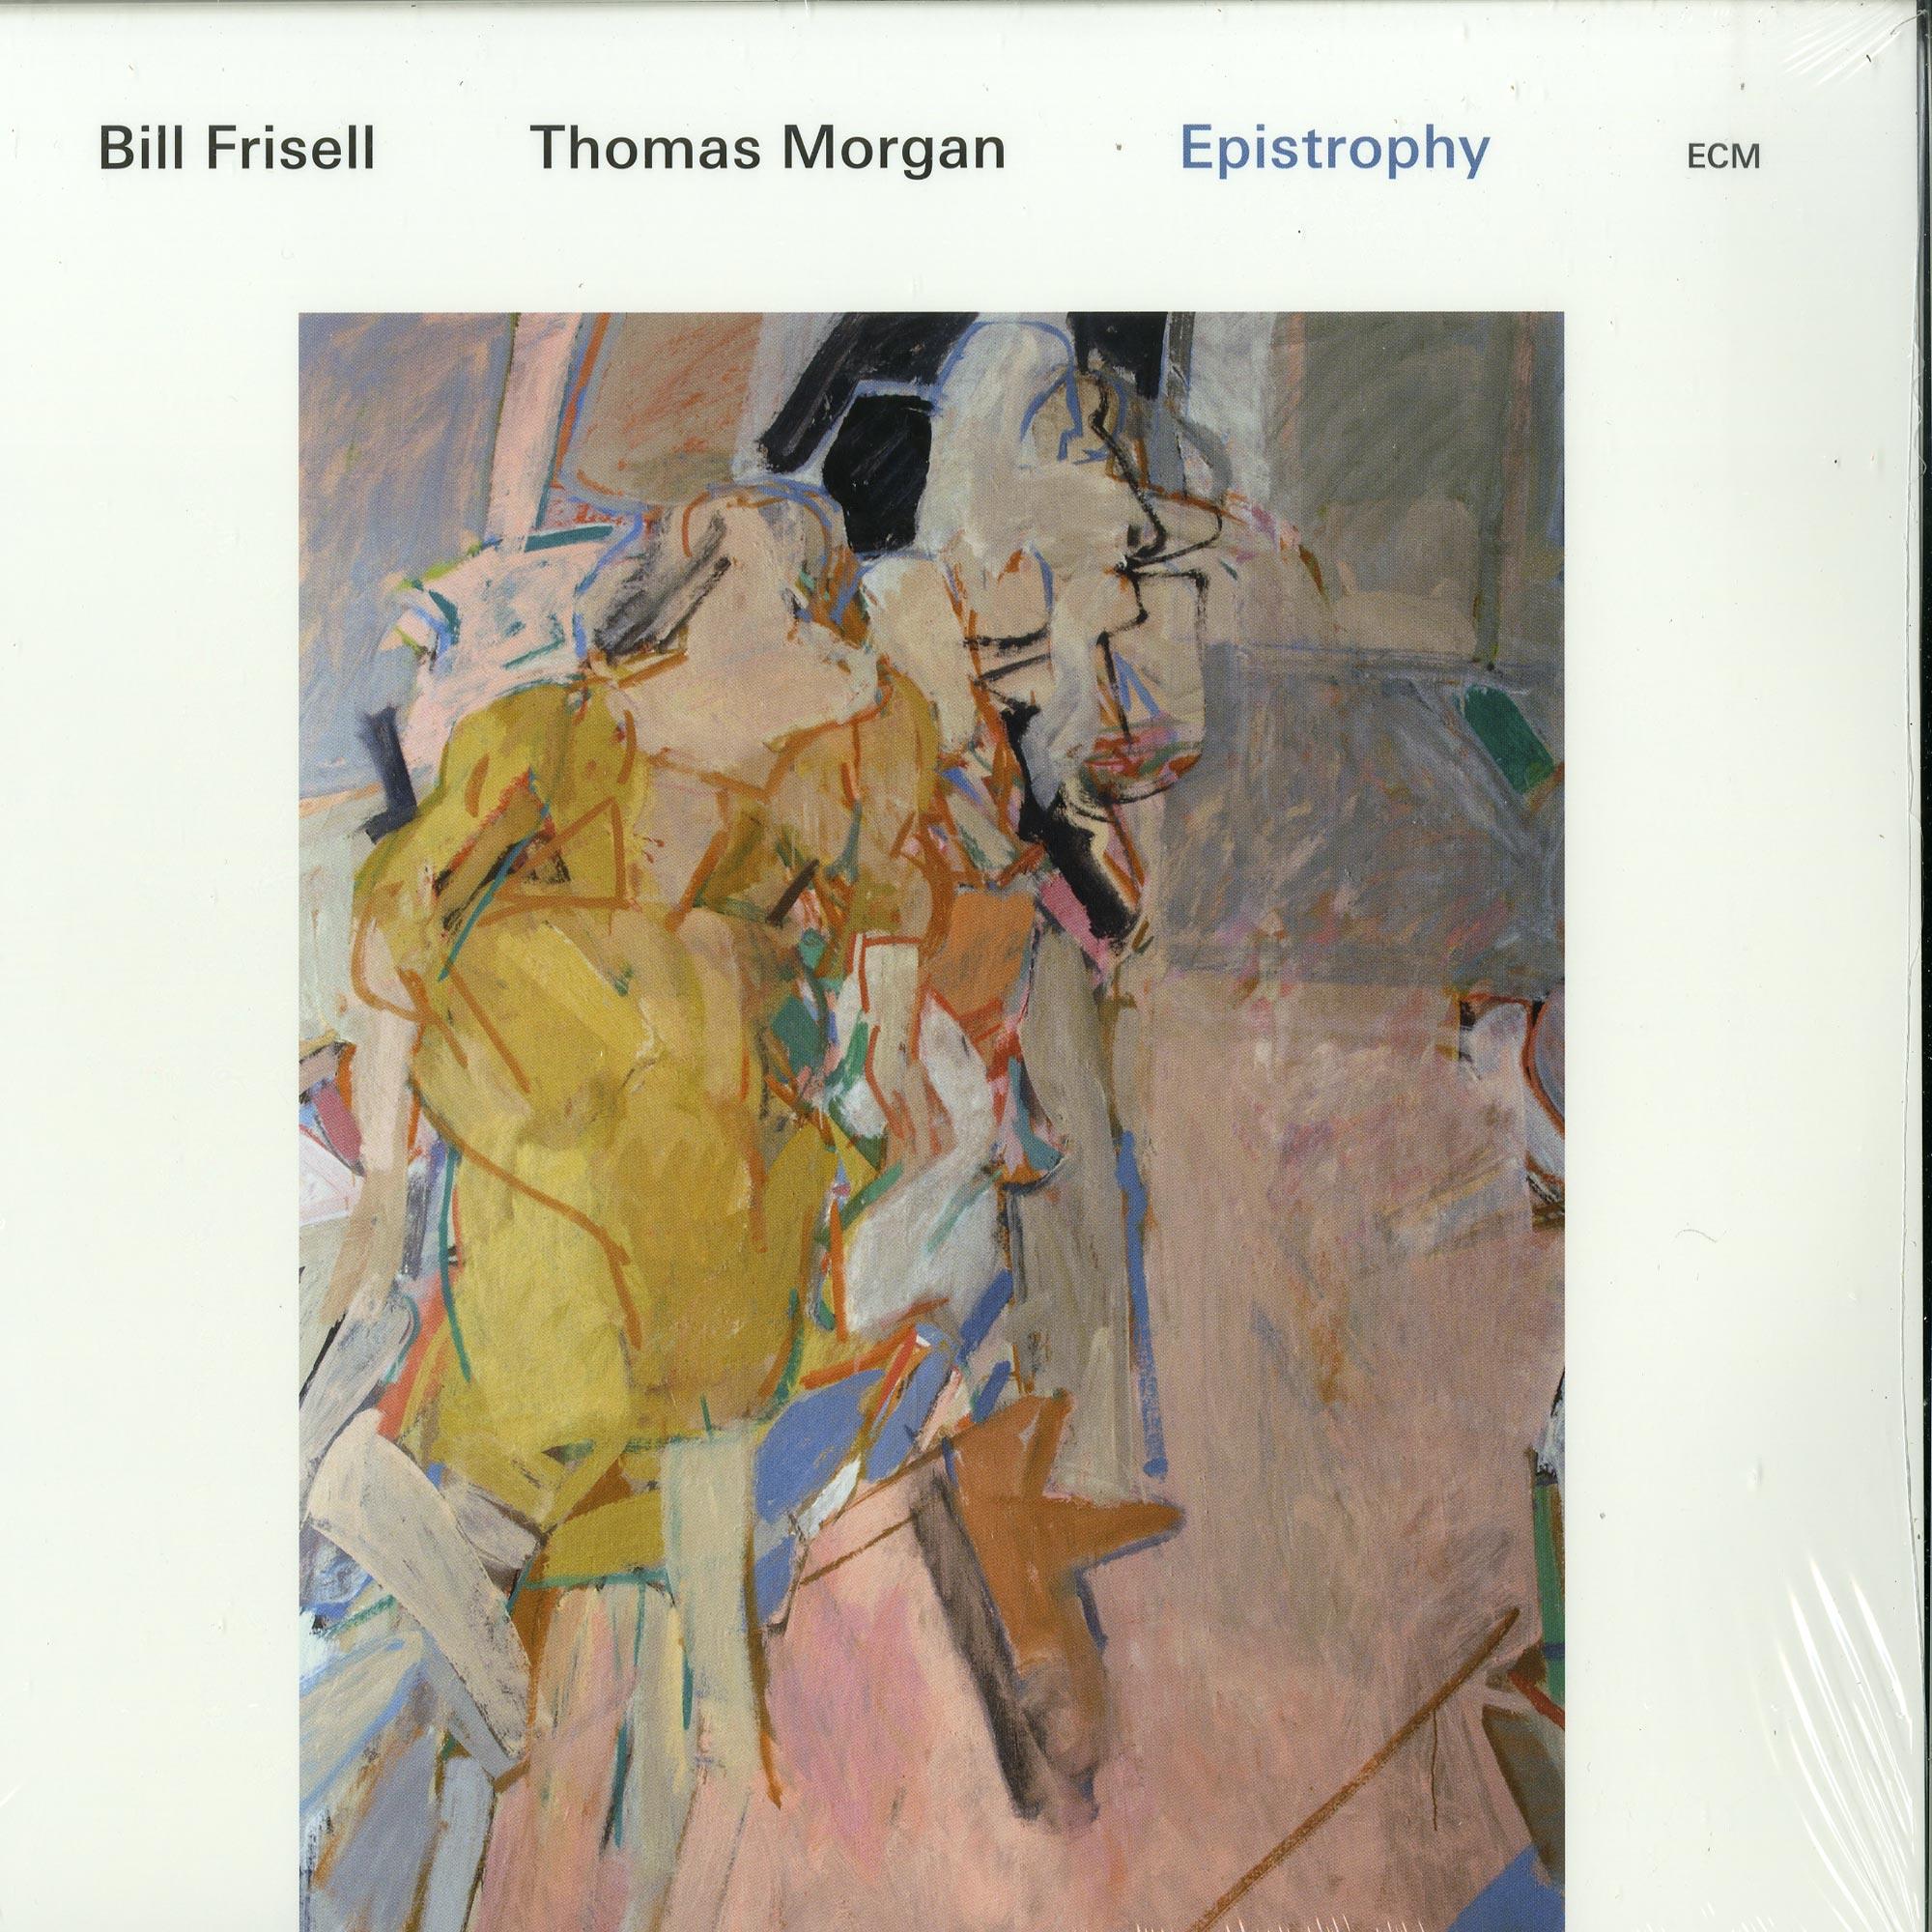 Thomas Morgan / Bill Frise - EPISTROPHY